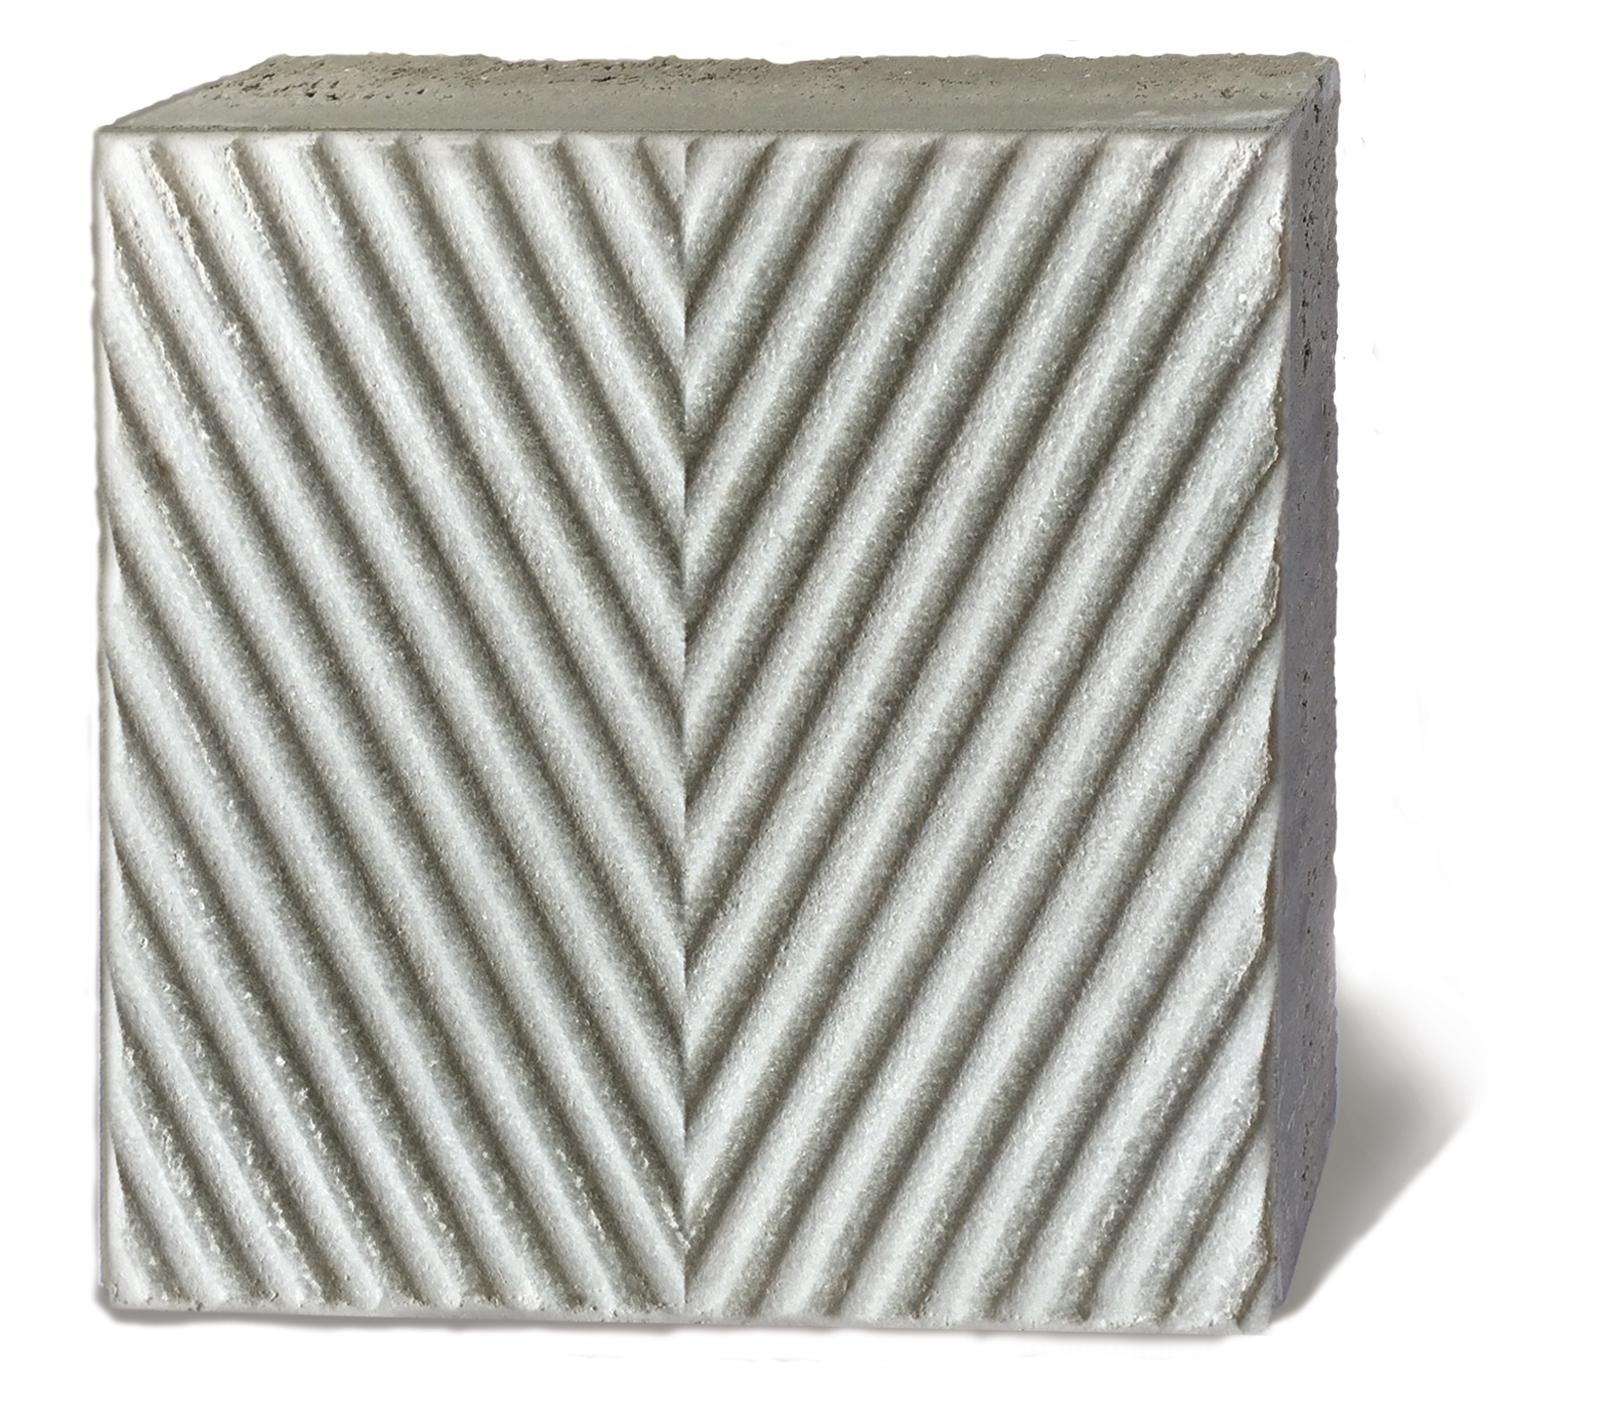 trottoirplatten-AP11-3D-viaplatten